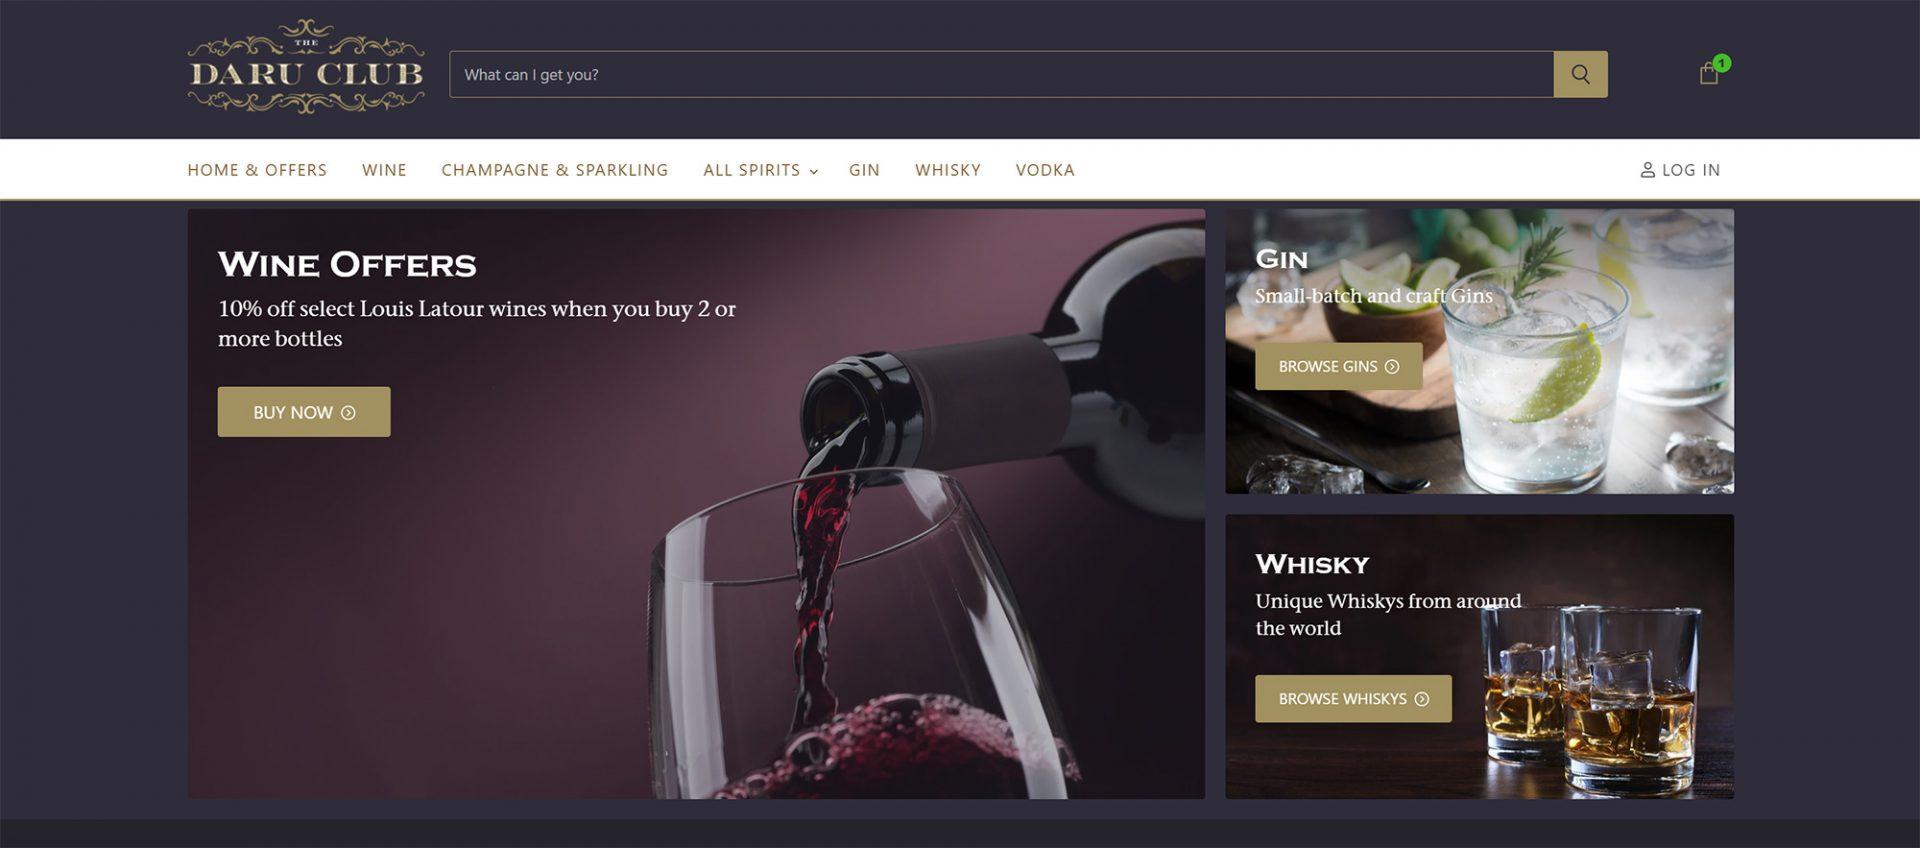 ecommerce-website-design-daru-farnborough-DGTL